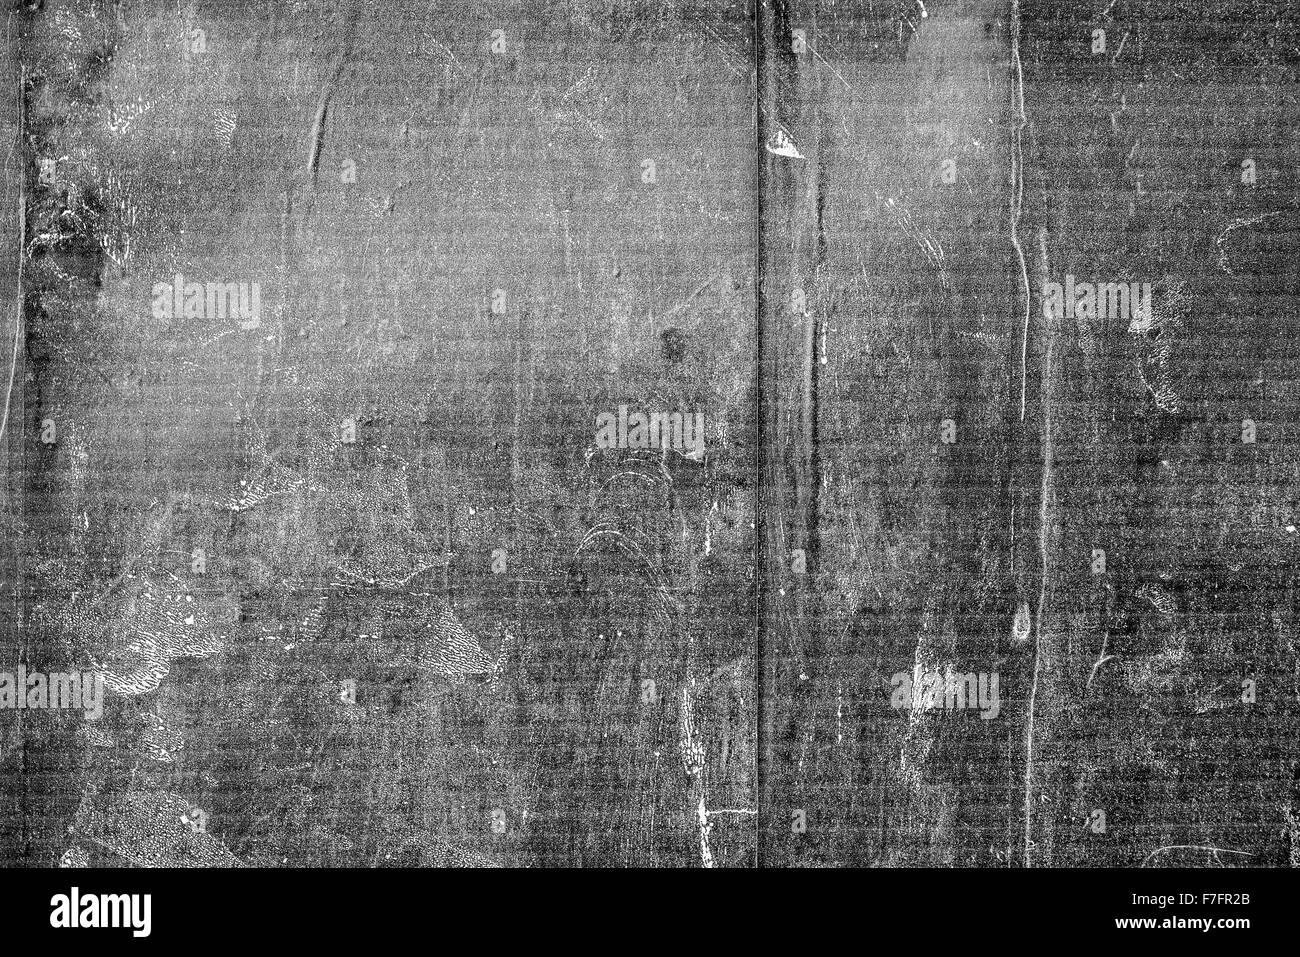 Monochromatic digital print texture on poster paper, inkjet printing technology background. - Stock Image